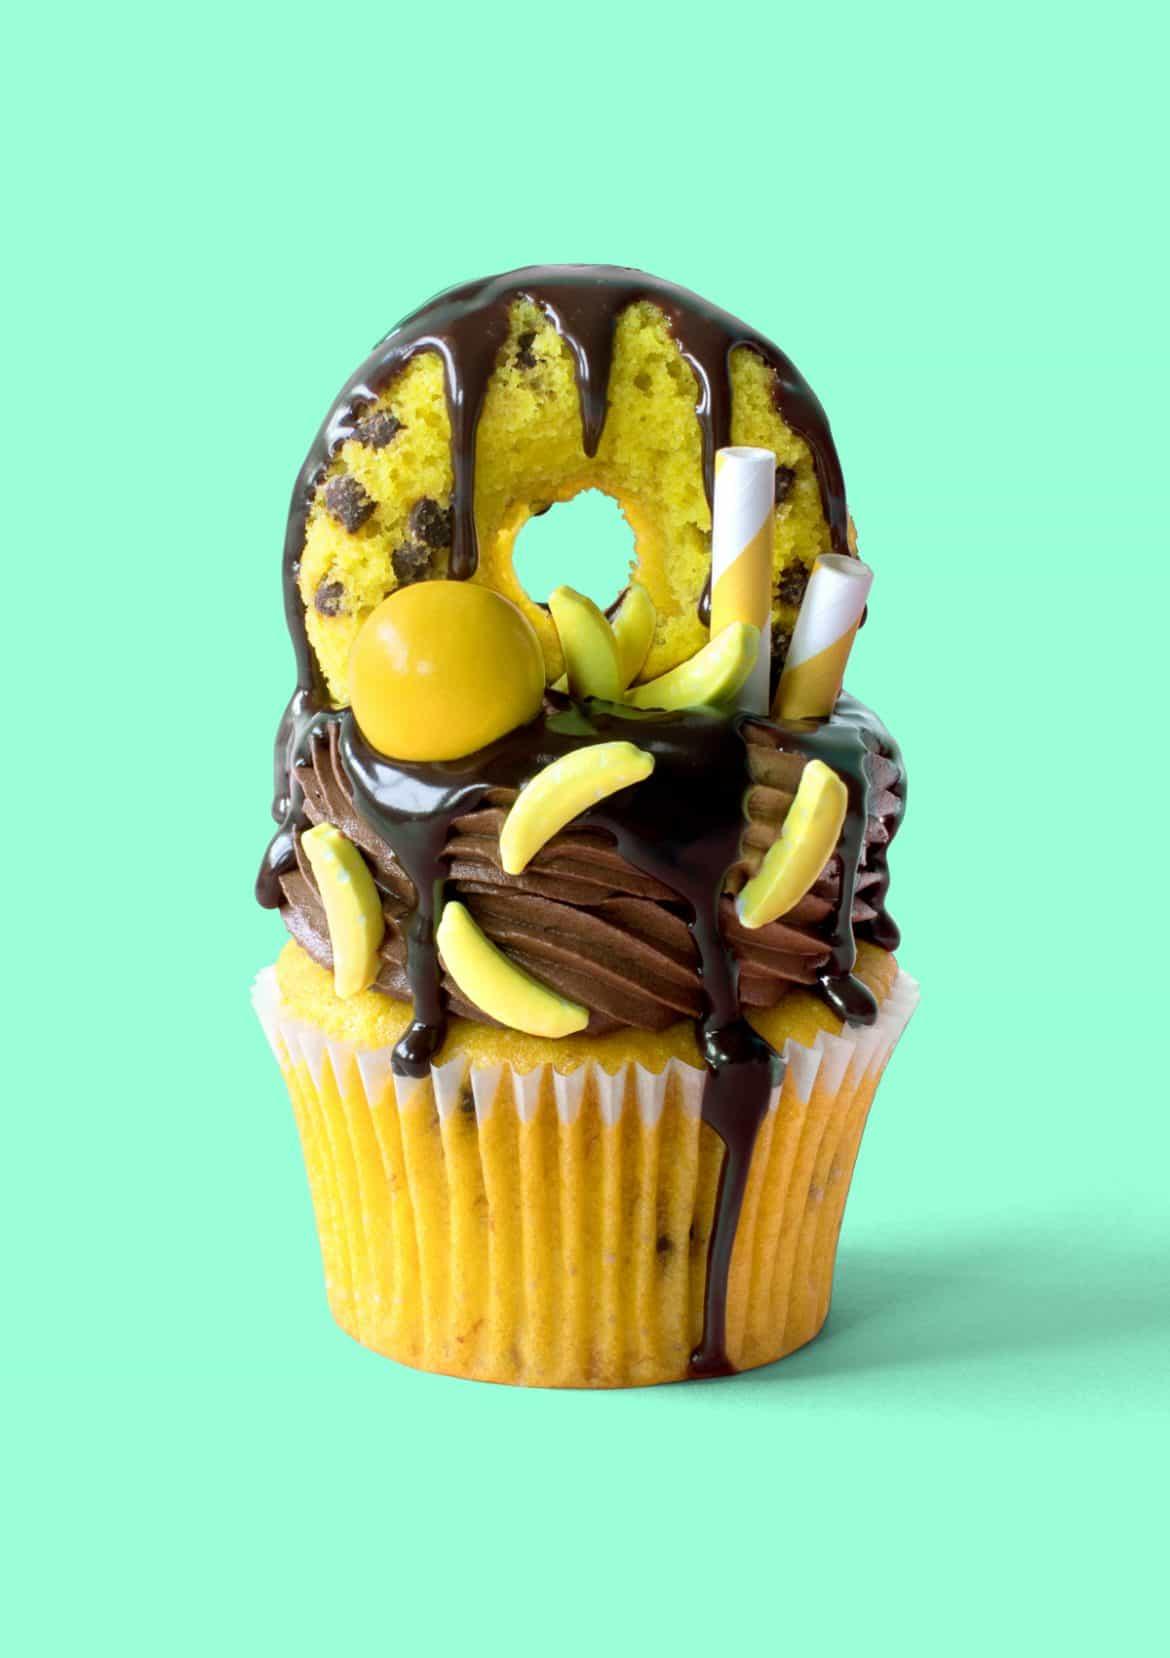 Banana Hammock Cupcakes